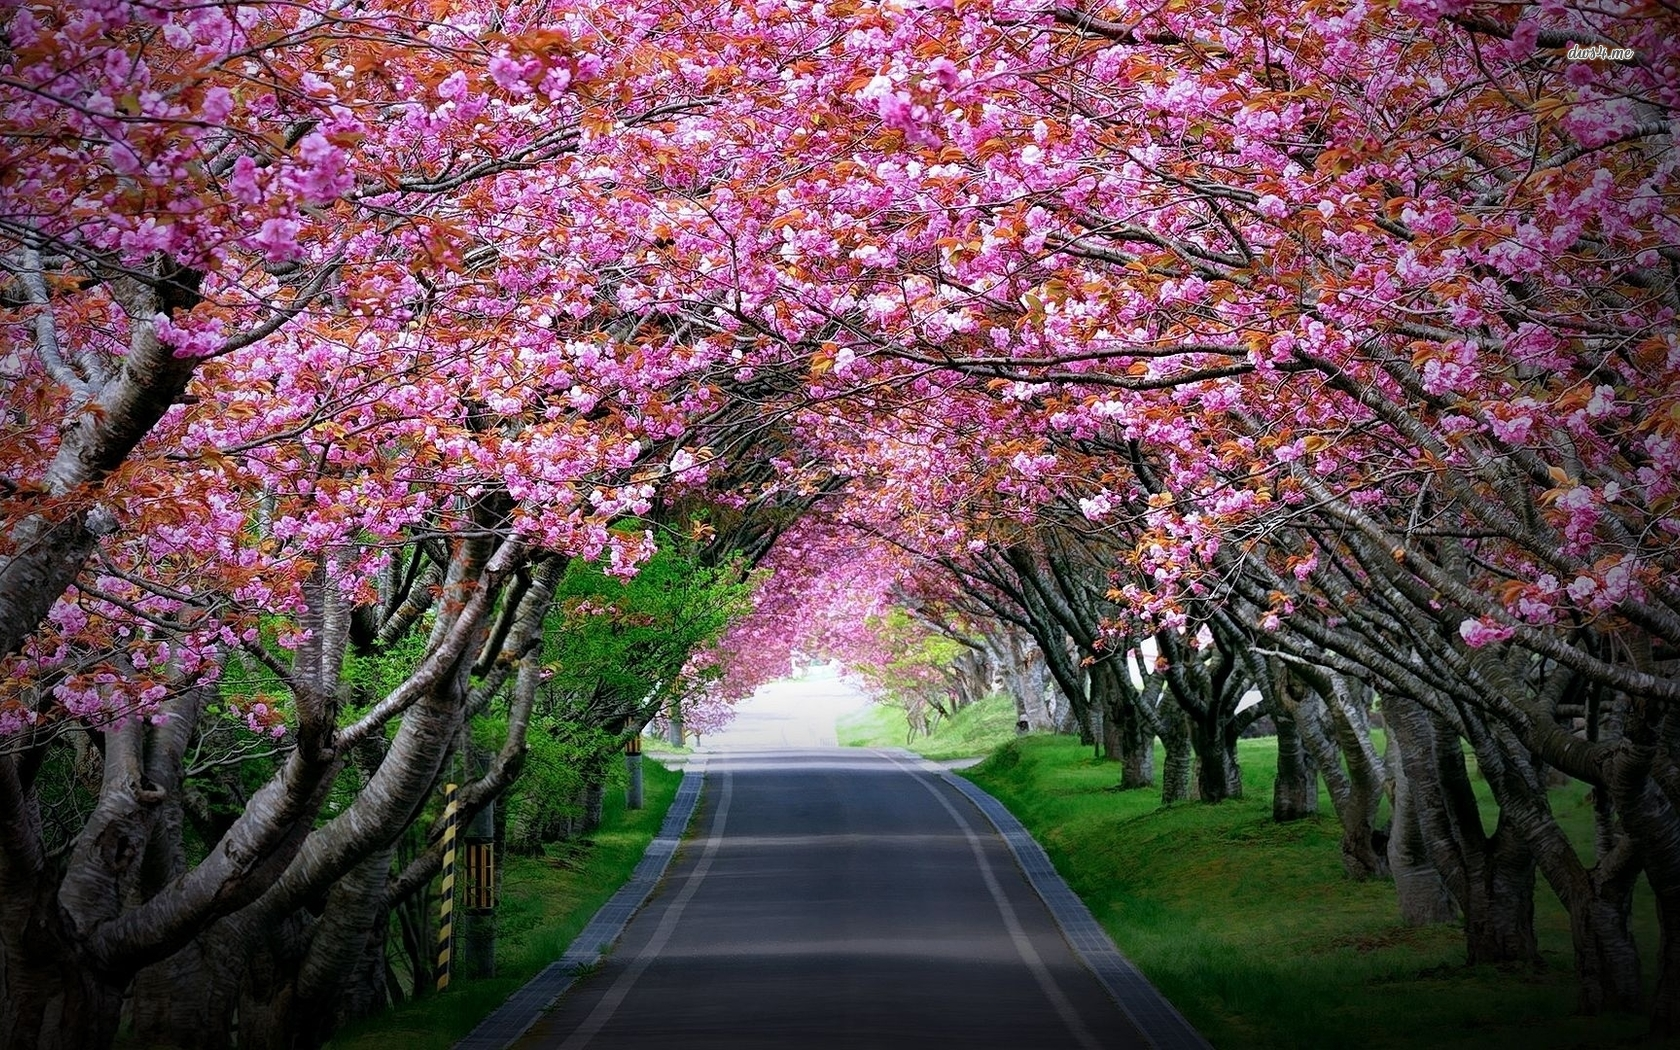 Cherry Blossom Tree Wallpaper - WallpaperSafari